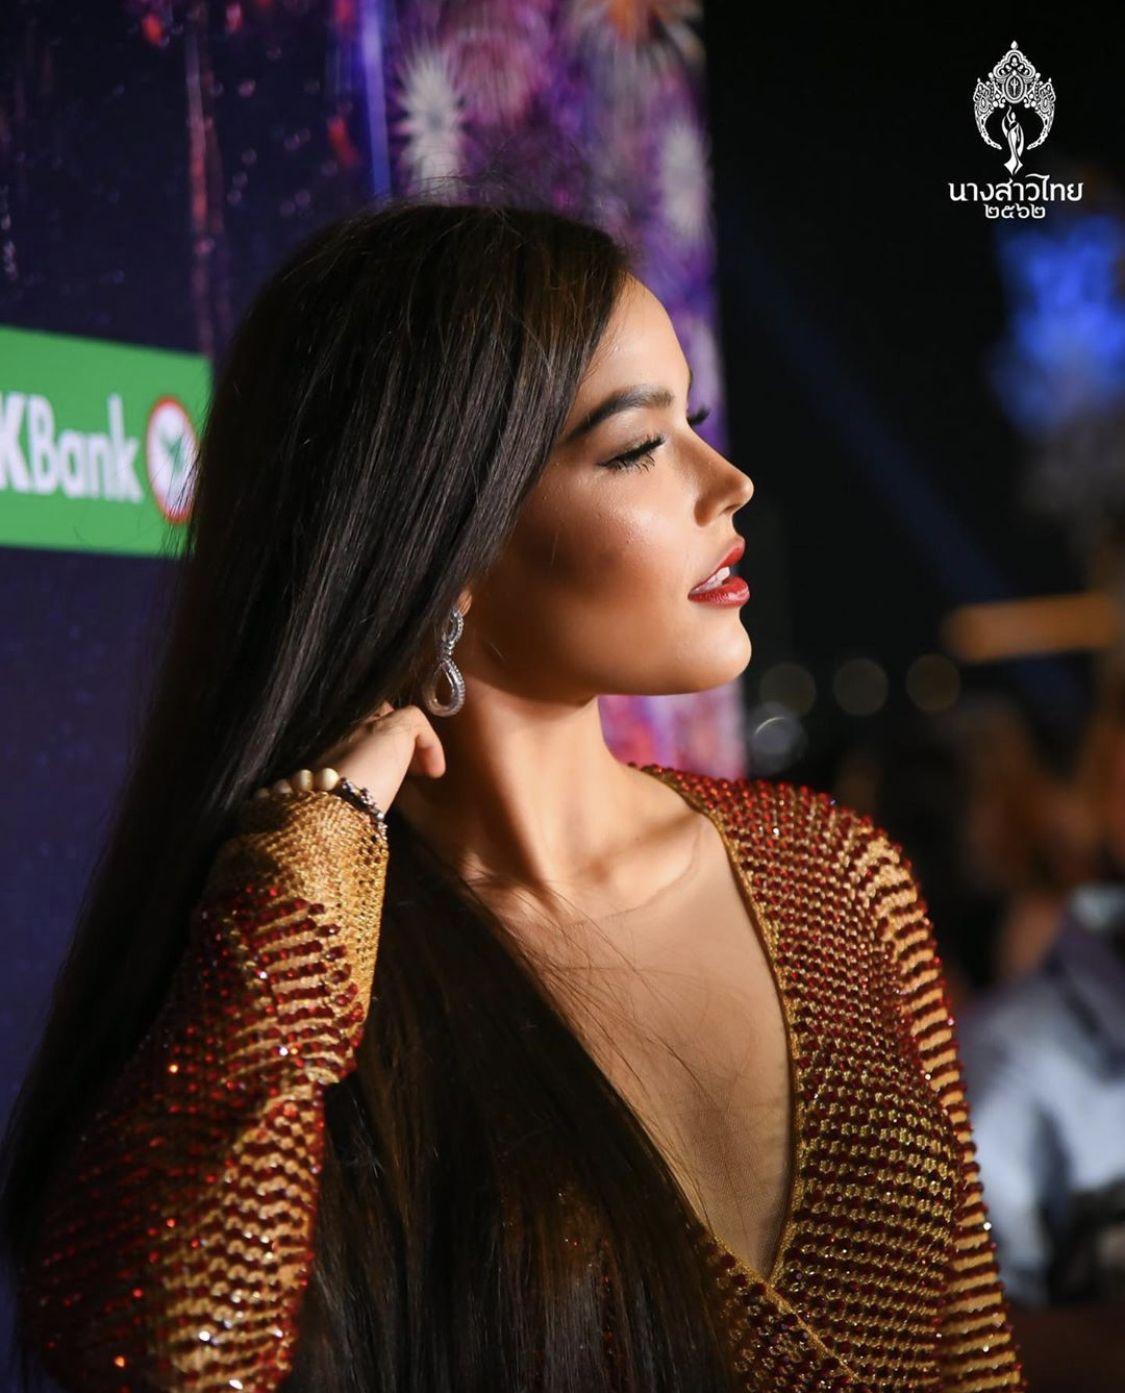 Very beautiful Fahsai Paweensuda Drouin at 2019 New Year's